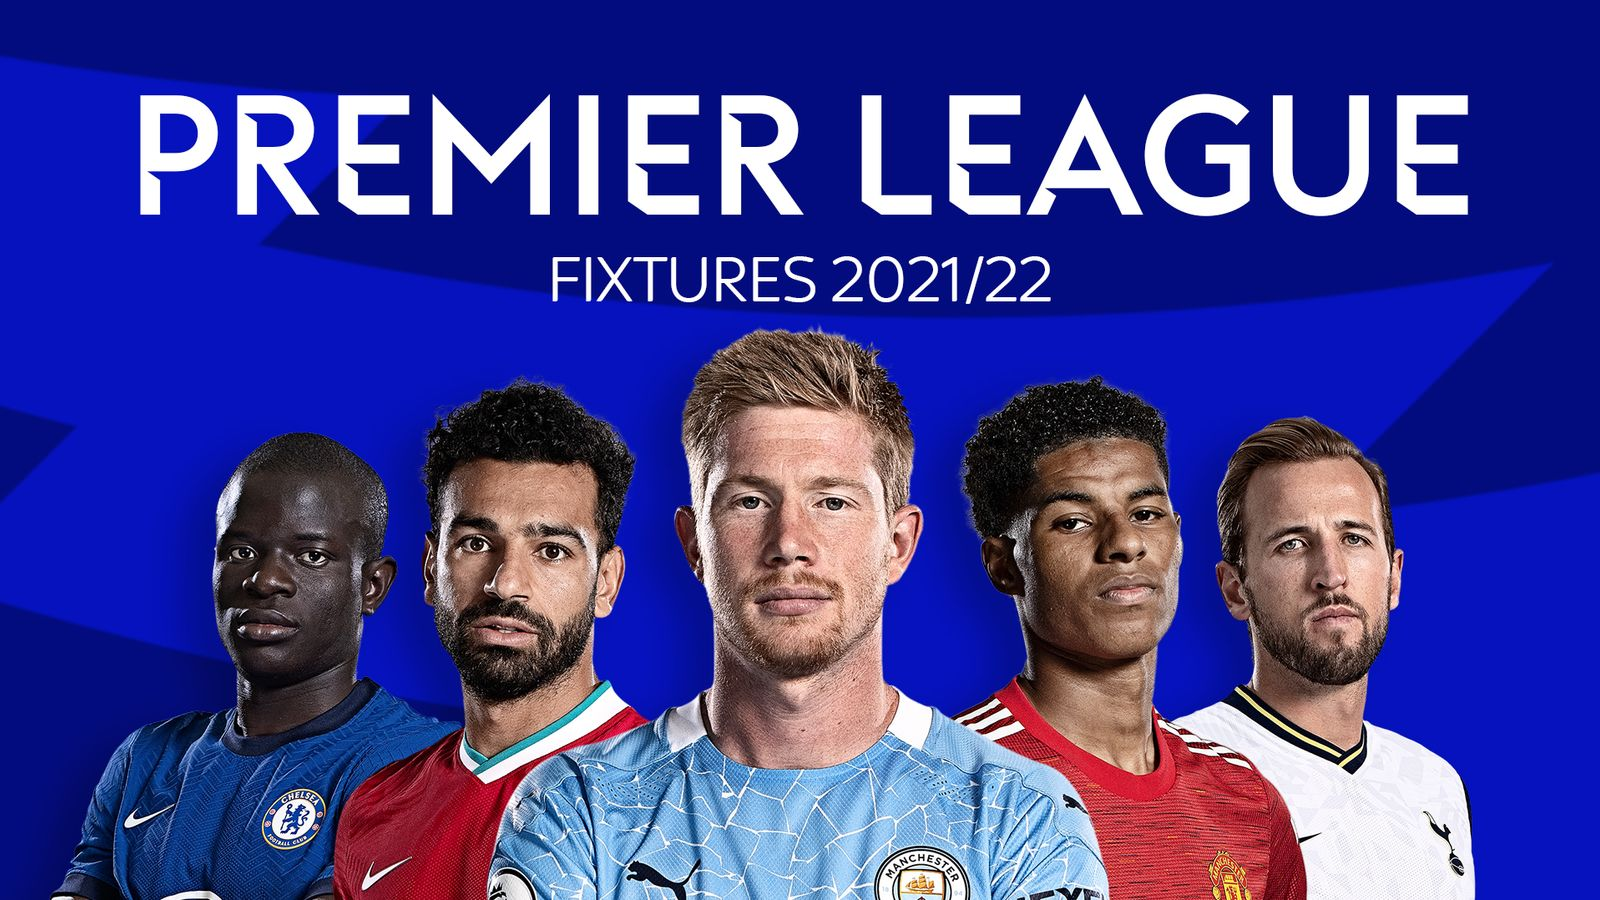 skysports-premier-league-fixtures_5415976.jpg?20210615153658